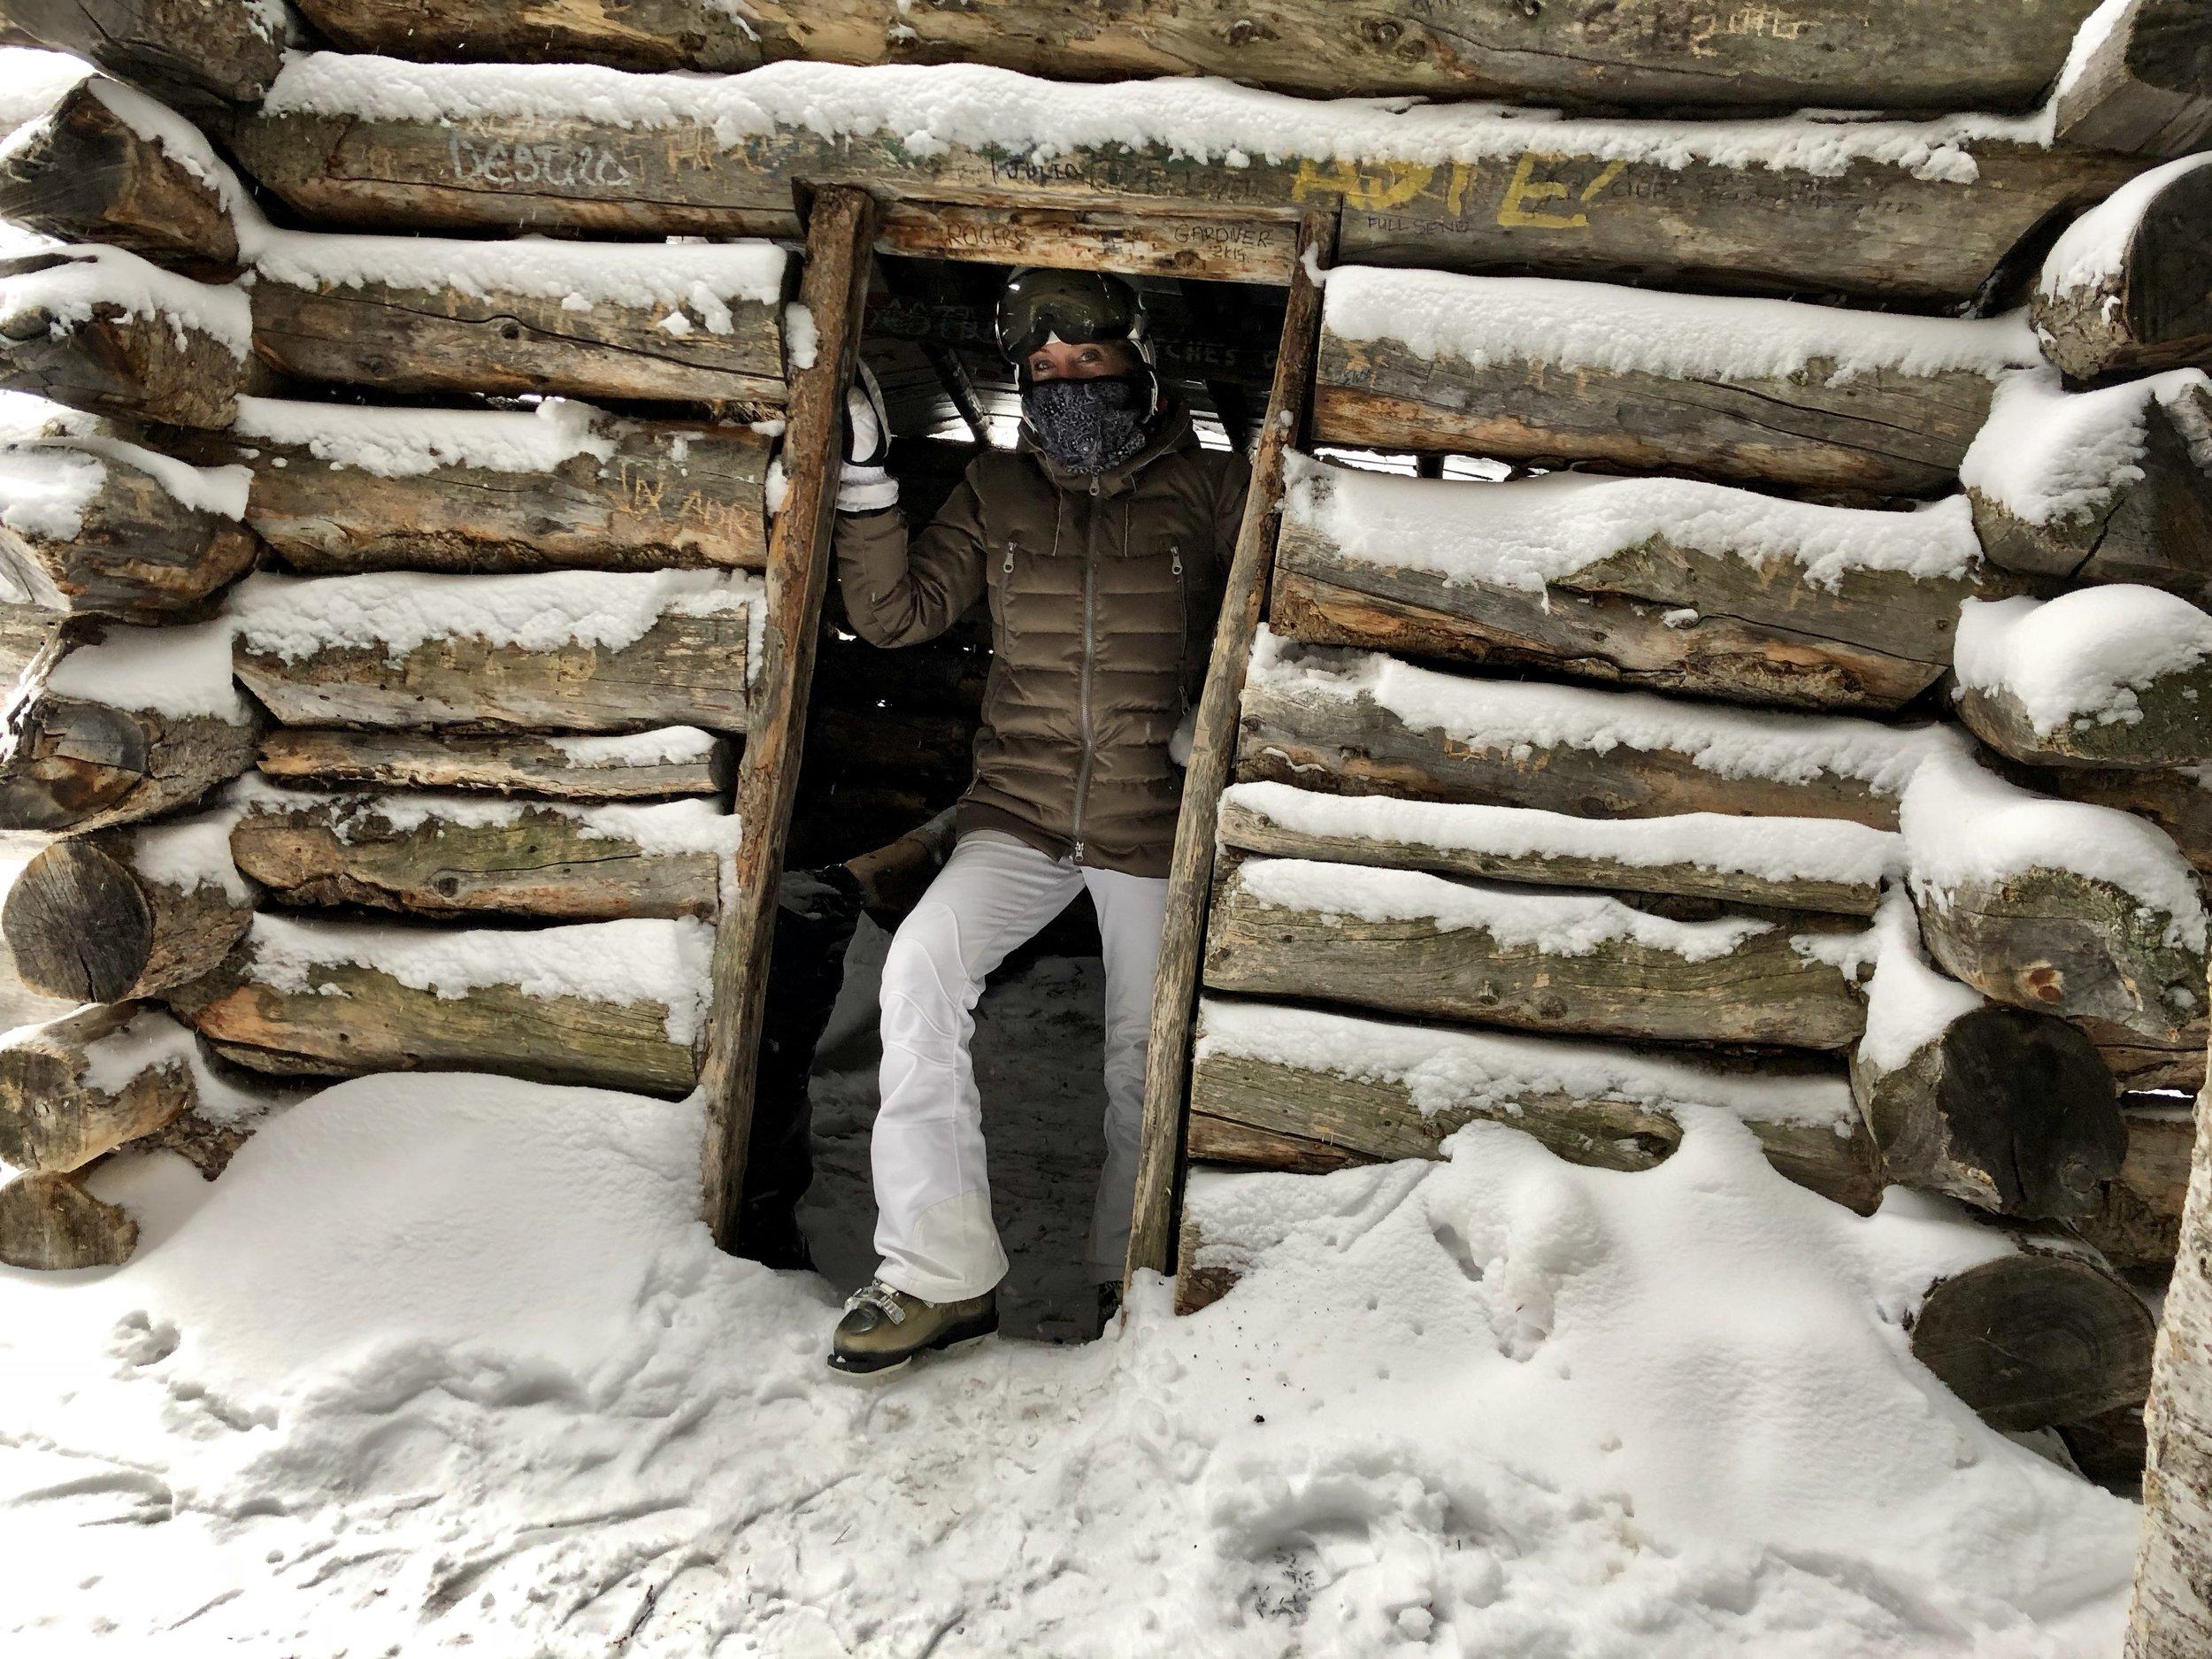 Secret hut off the beaten path...